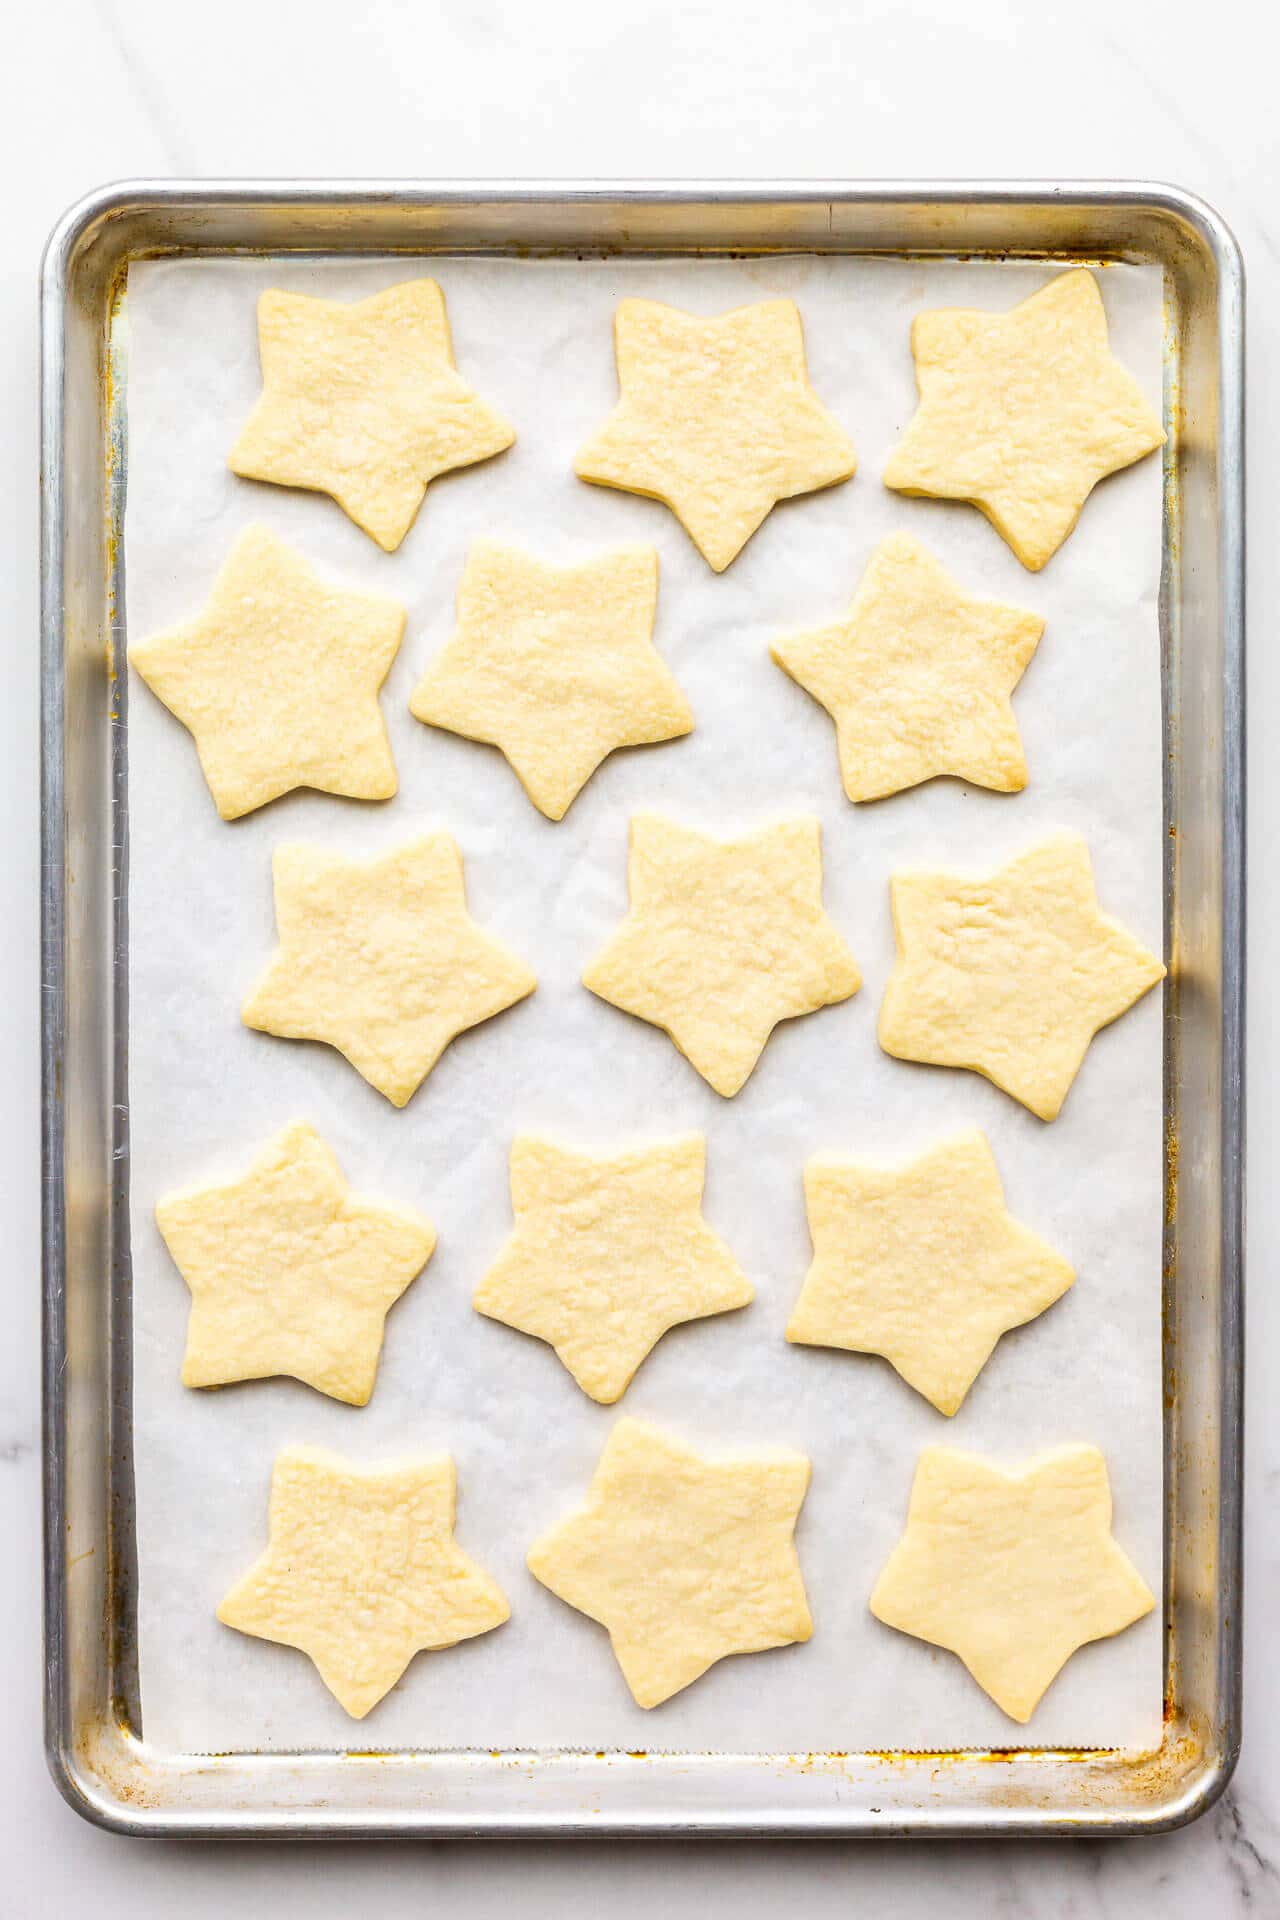 Freshly baked star-shaped shortbread cookies.